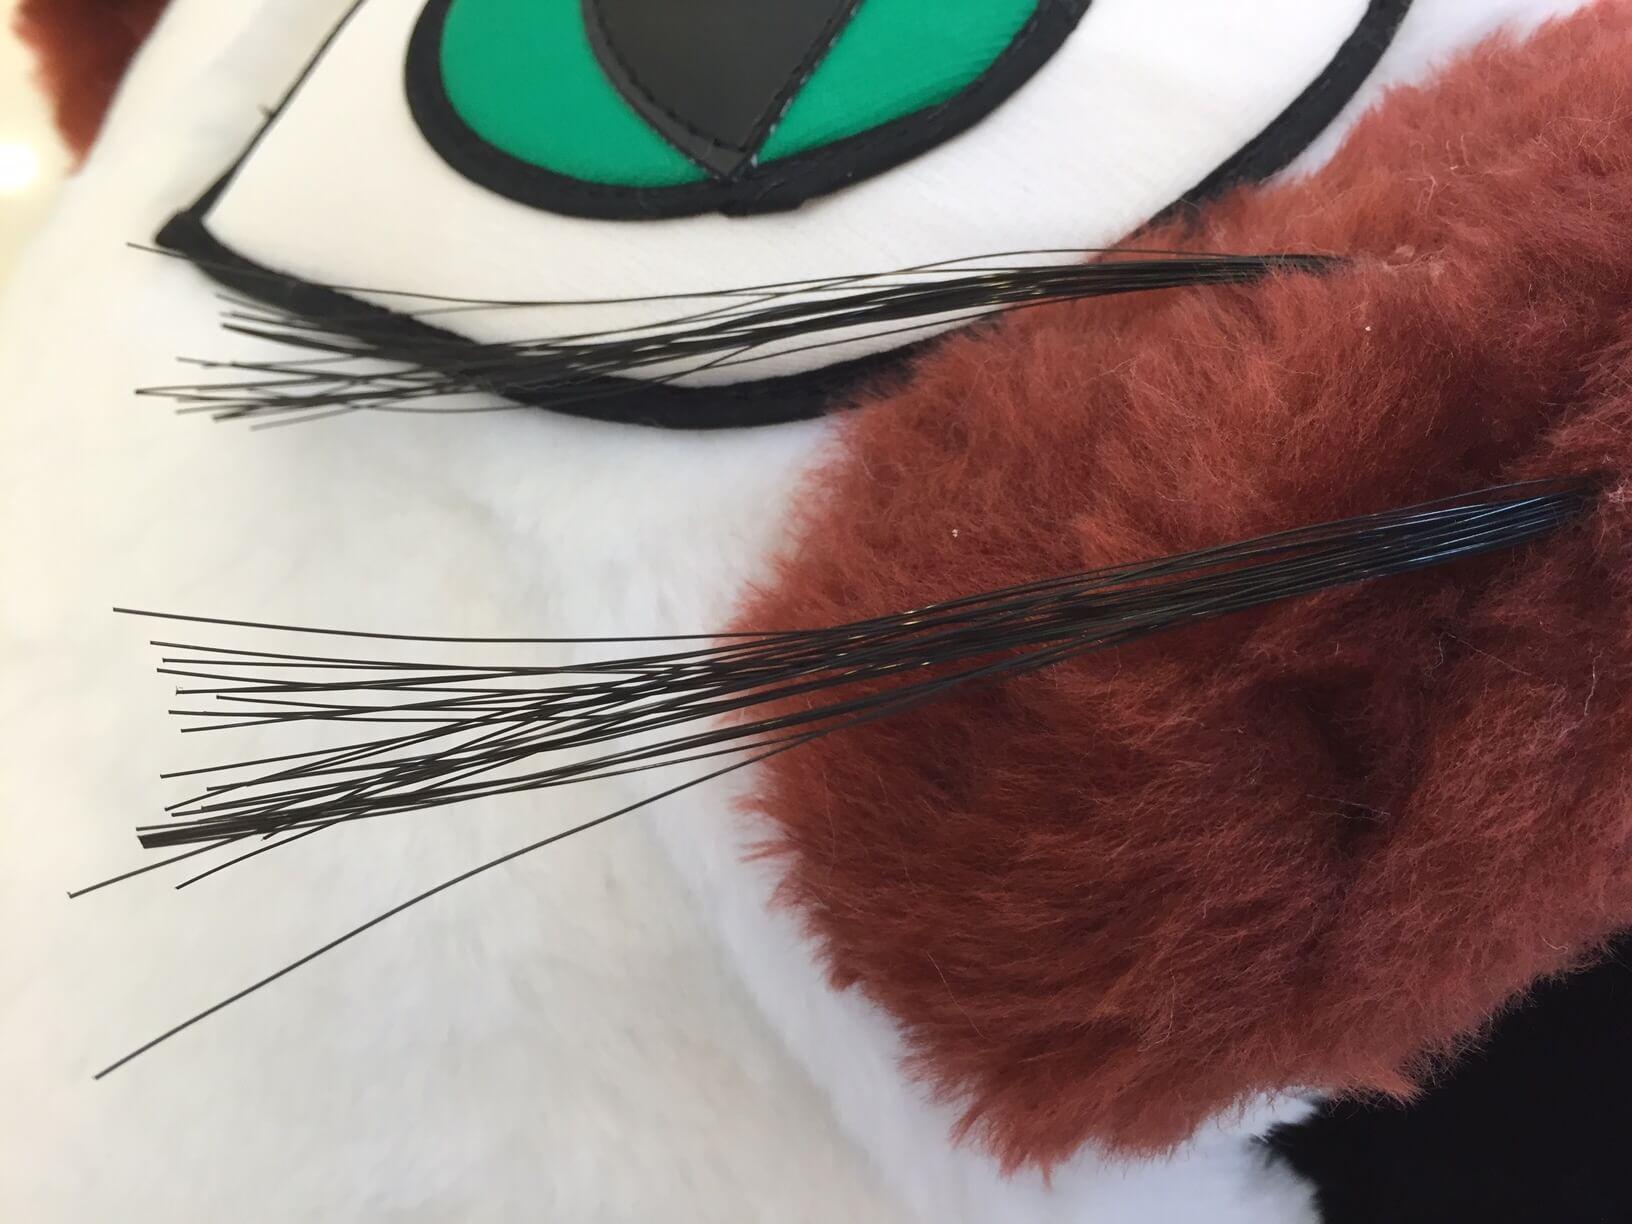 Katze-33p-Kostuem